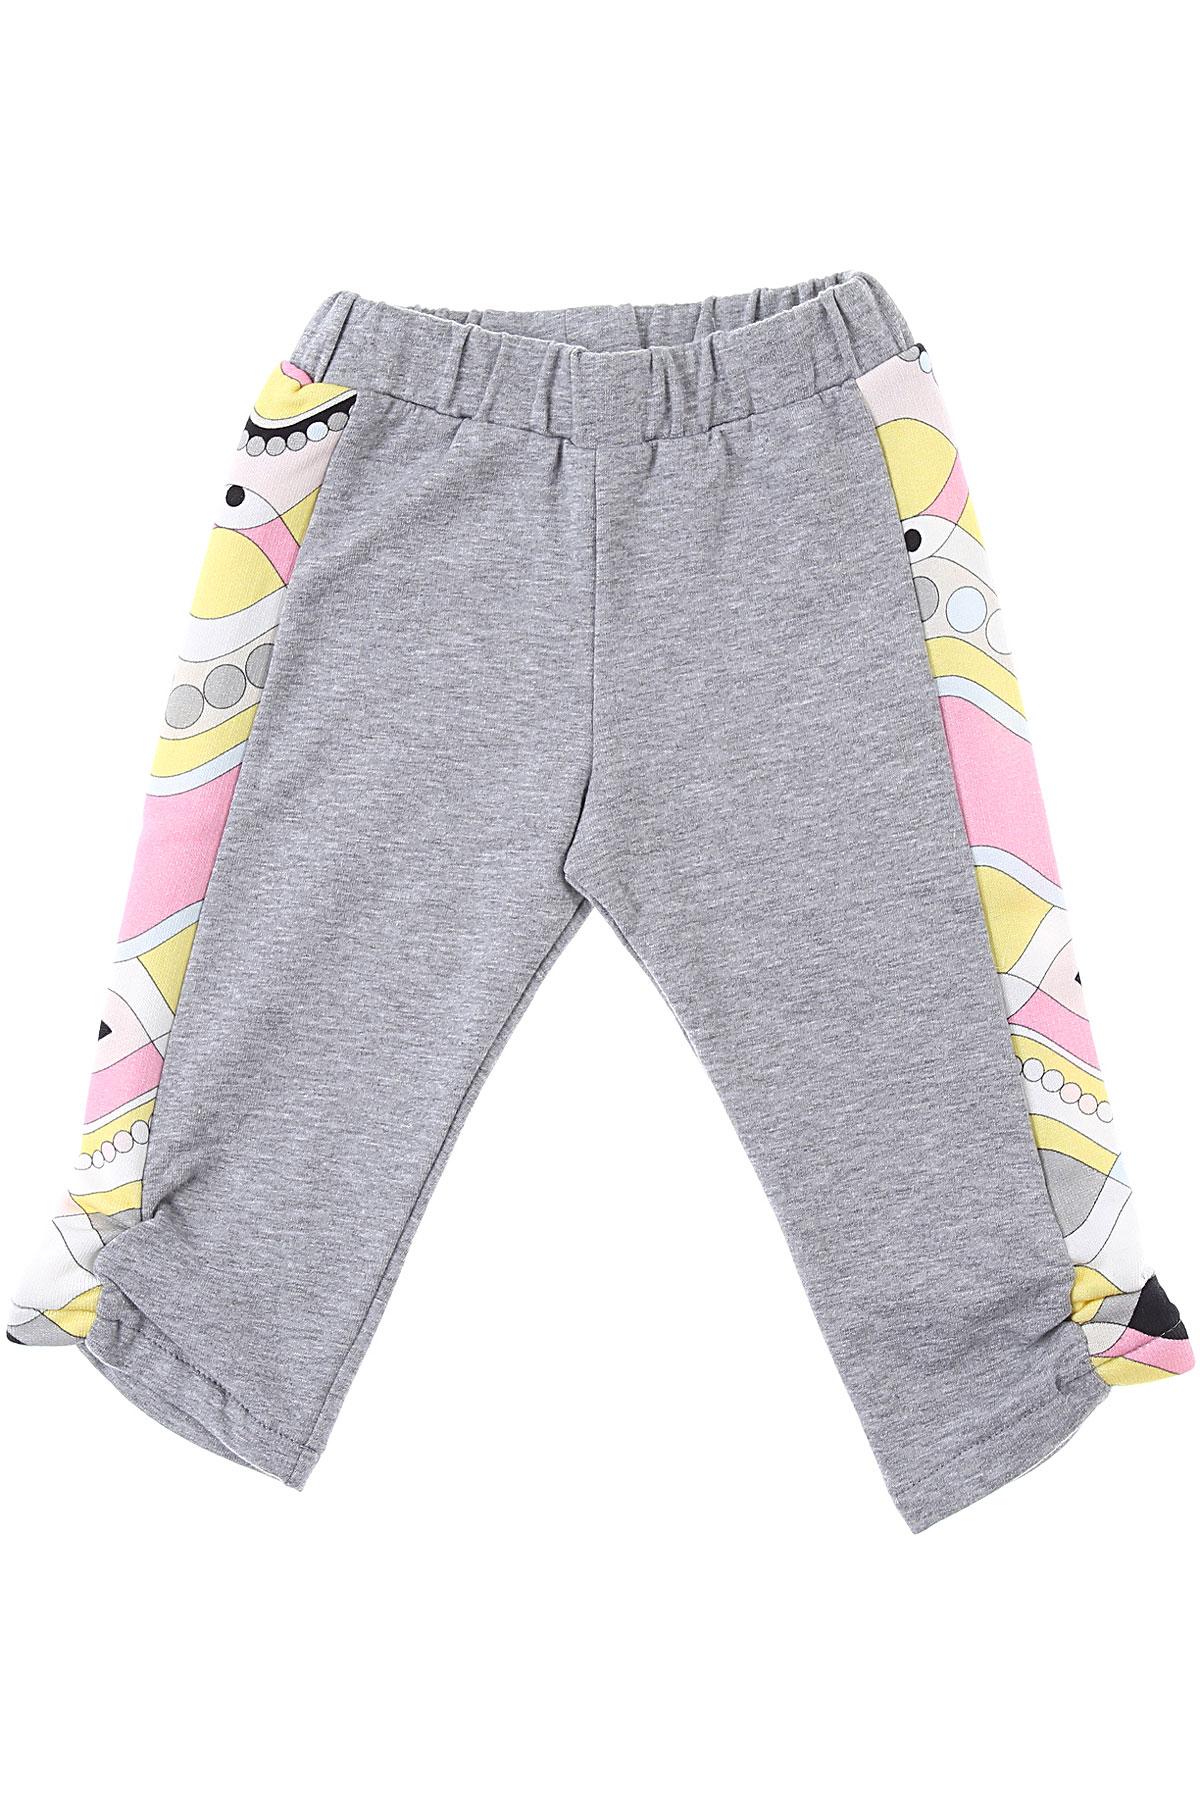 Emilio Pucci Baby Sweatpants for Girls On Sale, Grey, Cotton, 2019, 12M 18M 2Y 6M 9M